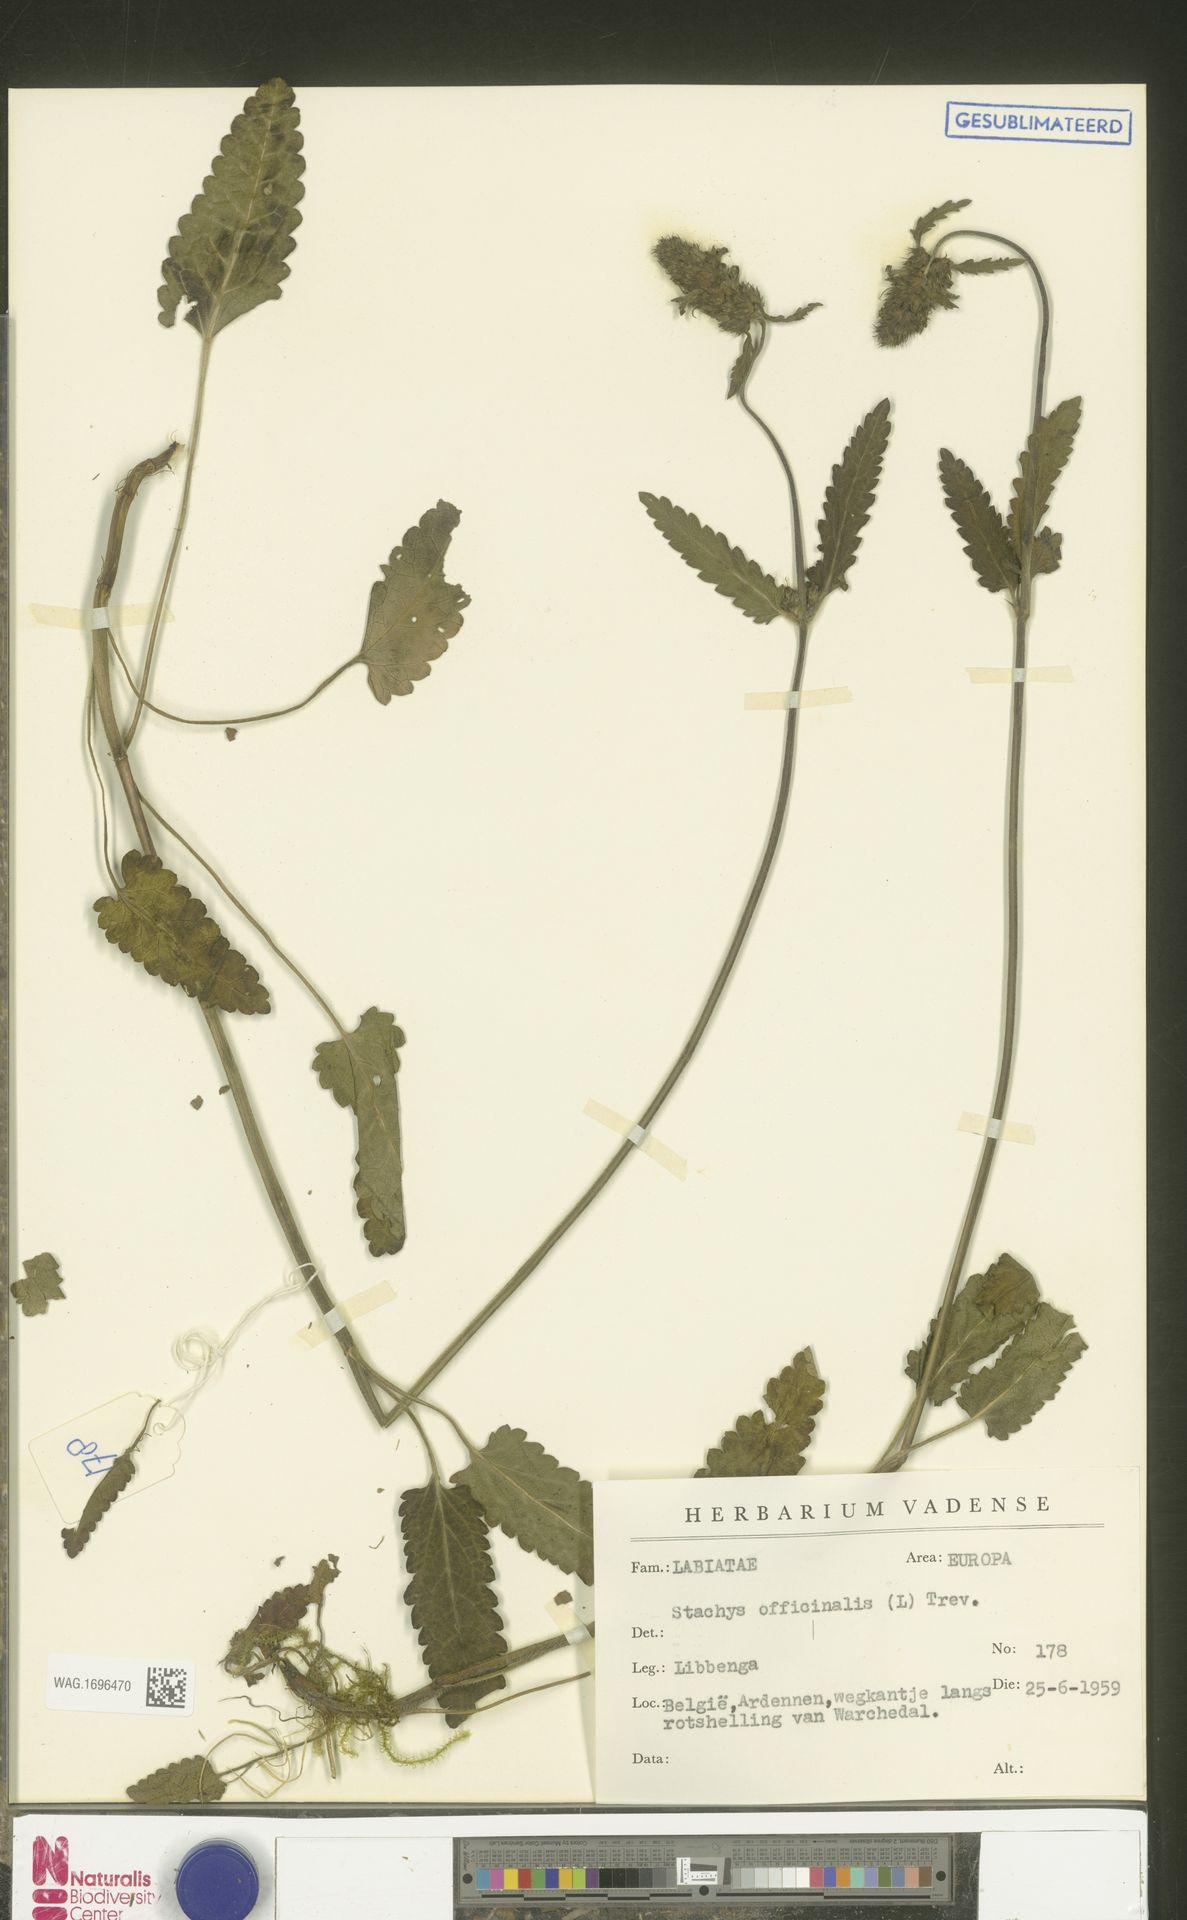 WAG.1696470 | Stachys officinalis (L.) Trevis.